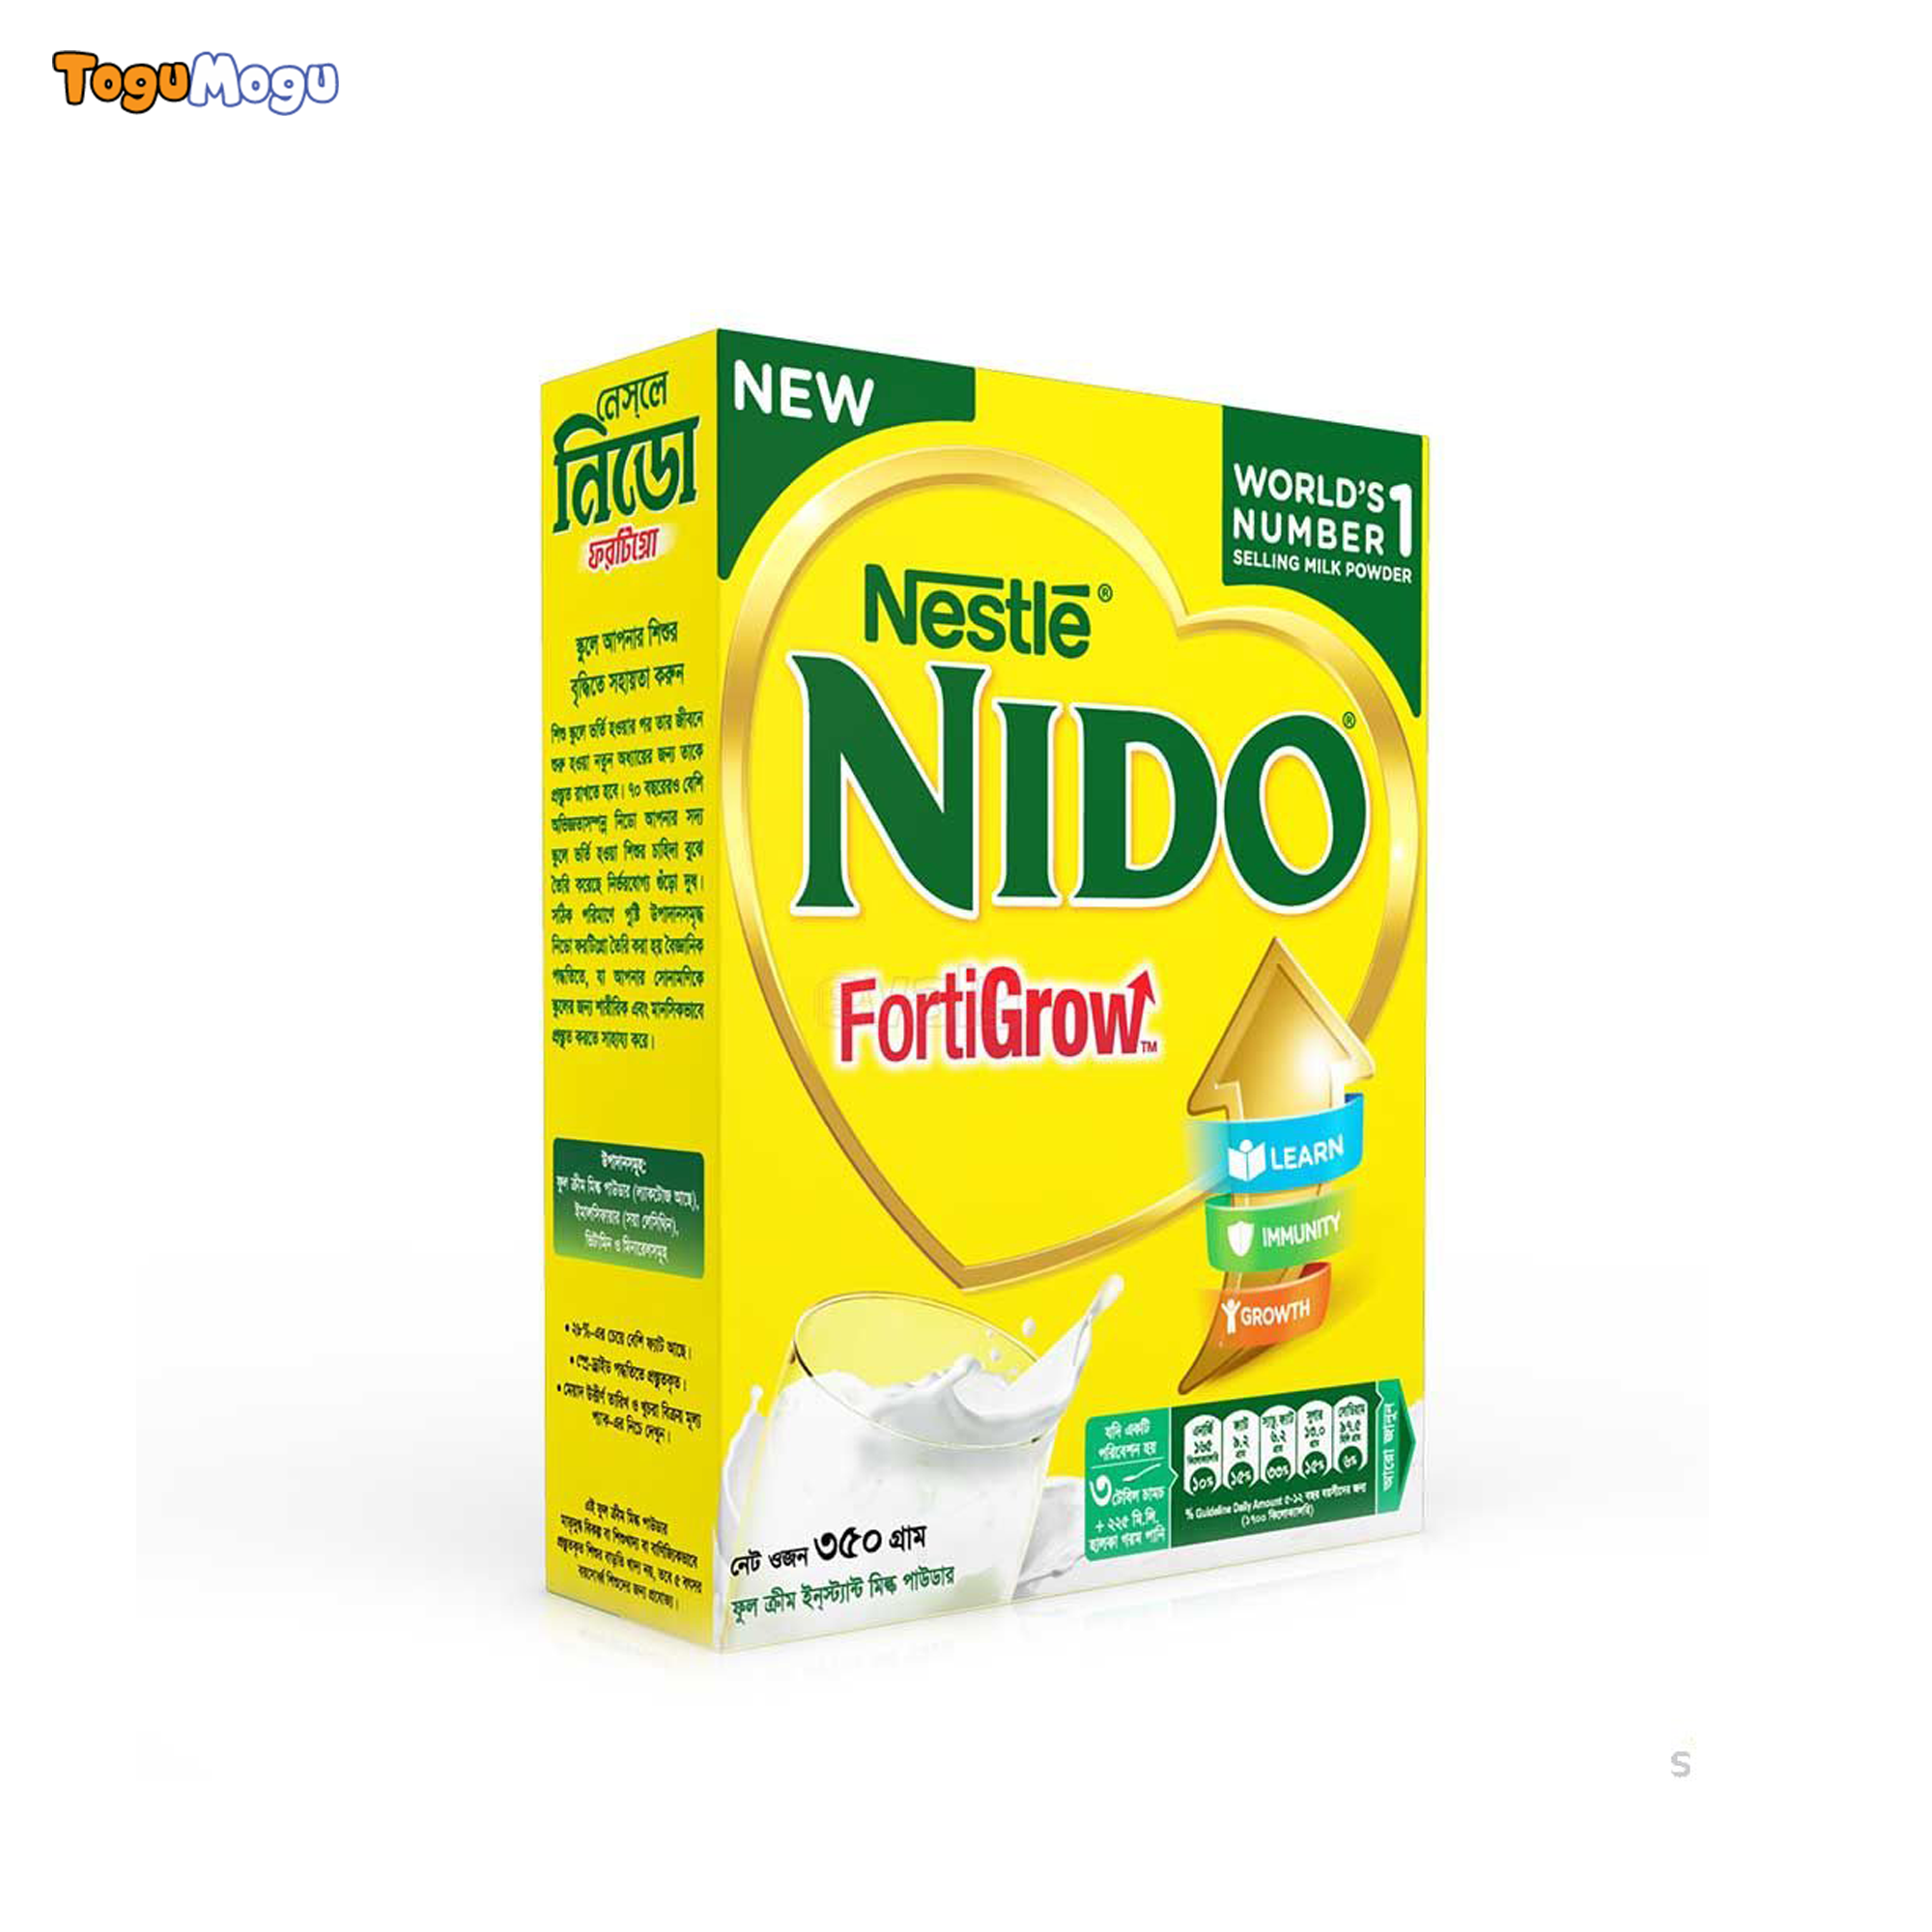 NIDO Fortified BIB 350g